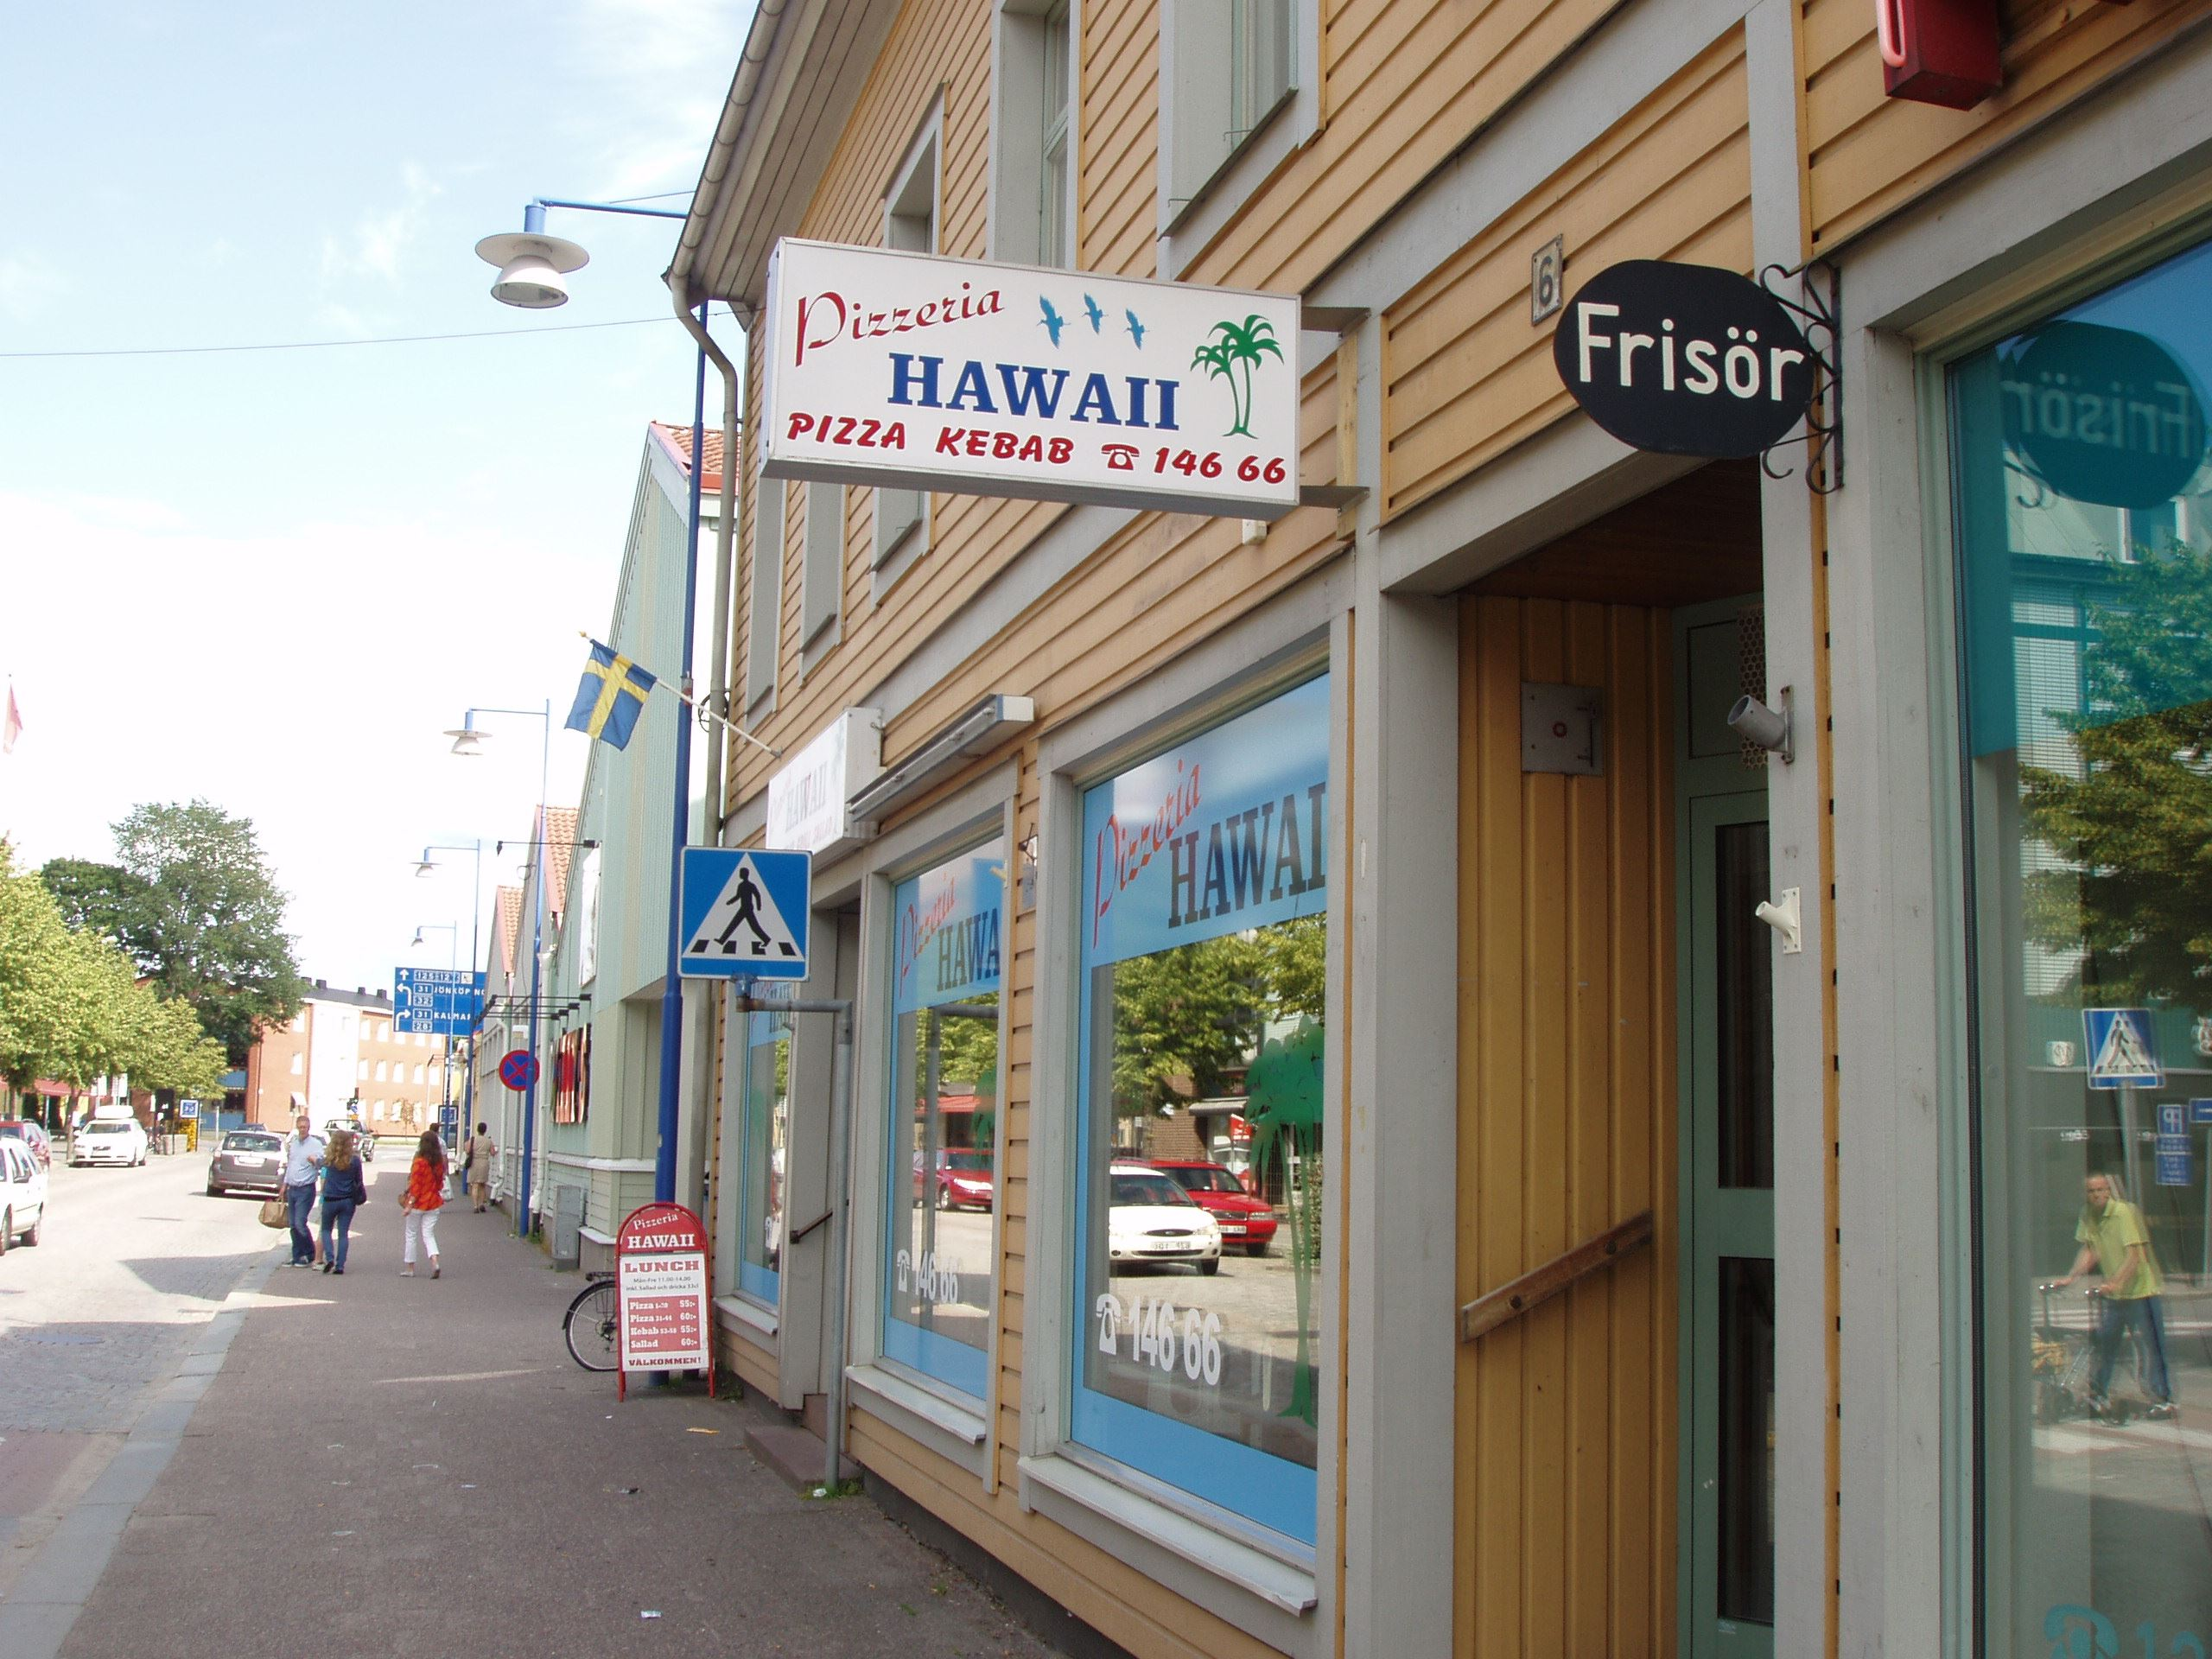 © Vetlanda Turistbyrå, Pizzeria Hawaii